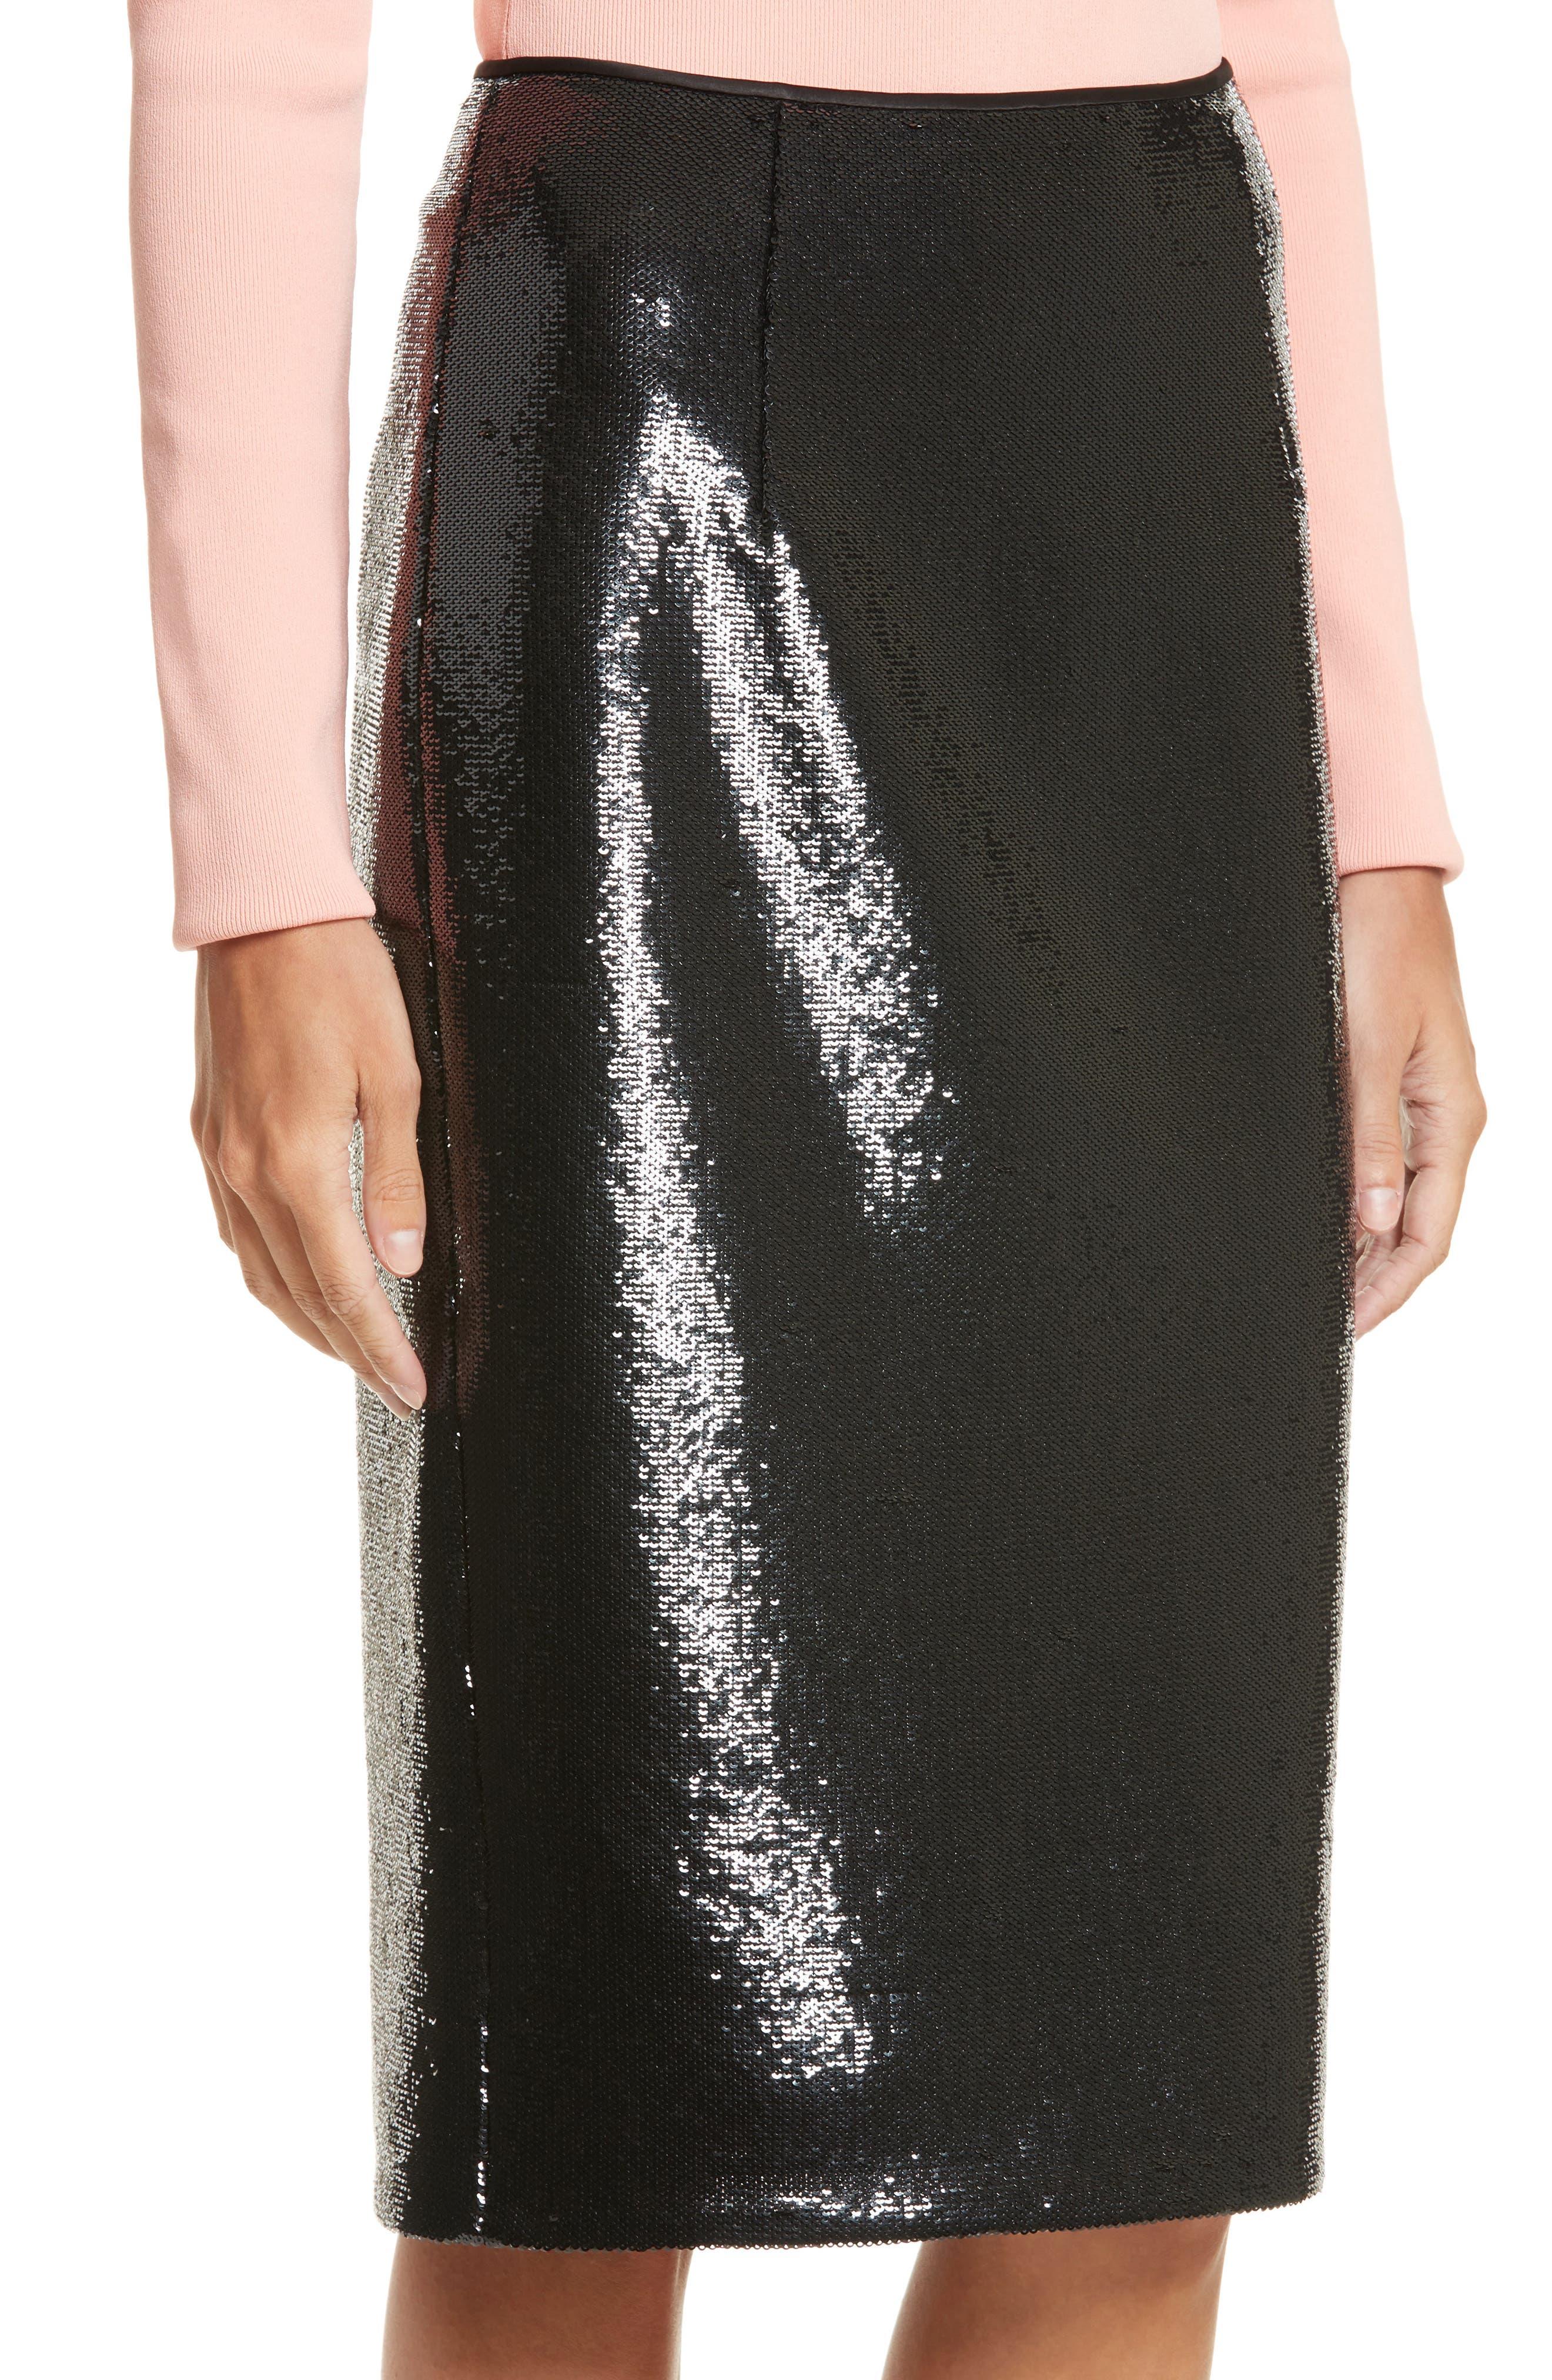 Diane von Furstenberg Sequin Pencil Skirt,                             Alternate thumbnail 4, color,                             001